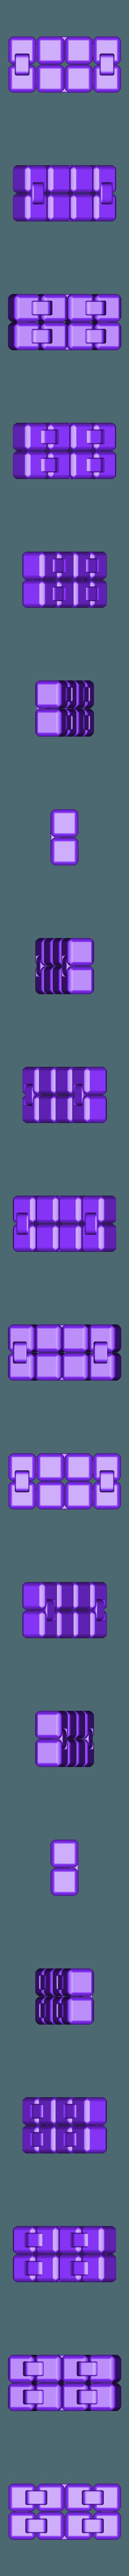 Fidget_Cube_blockGap0.2_hingeGap0.2.stl Download free STL file Fidget Cube Remix • Object to 3D print, WalterHsiao